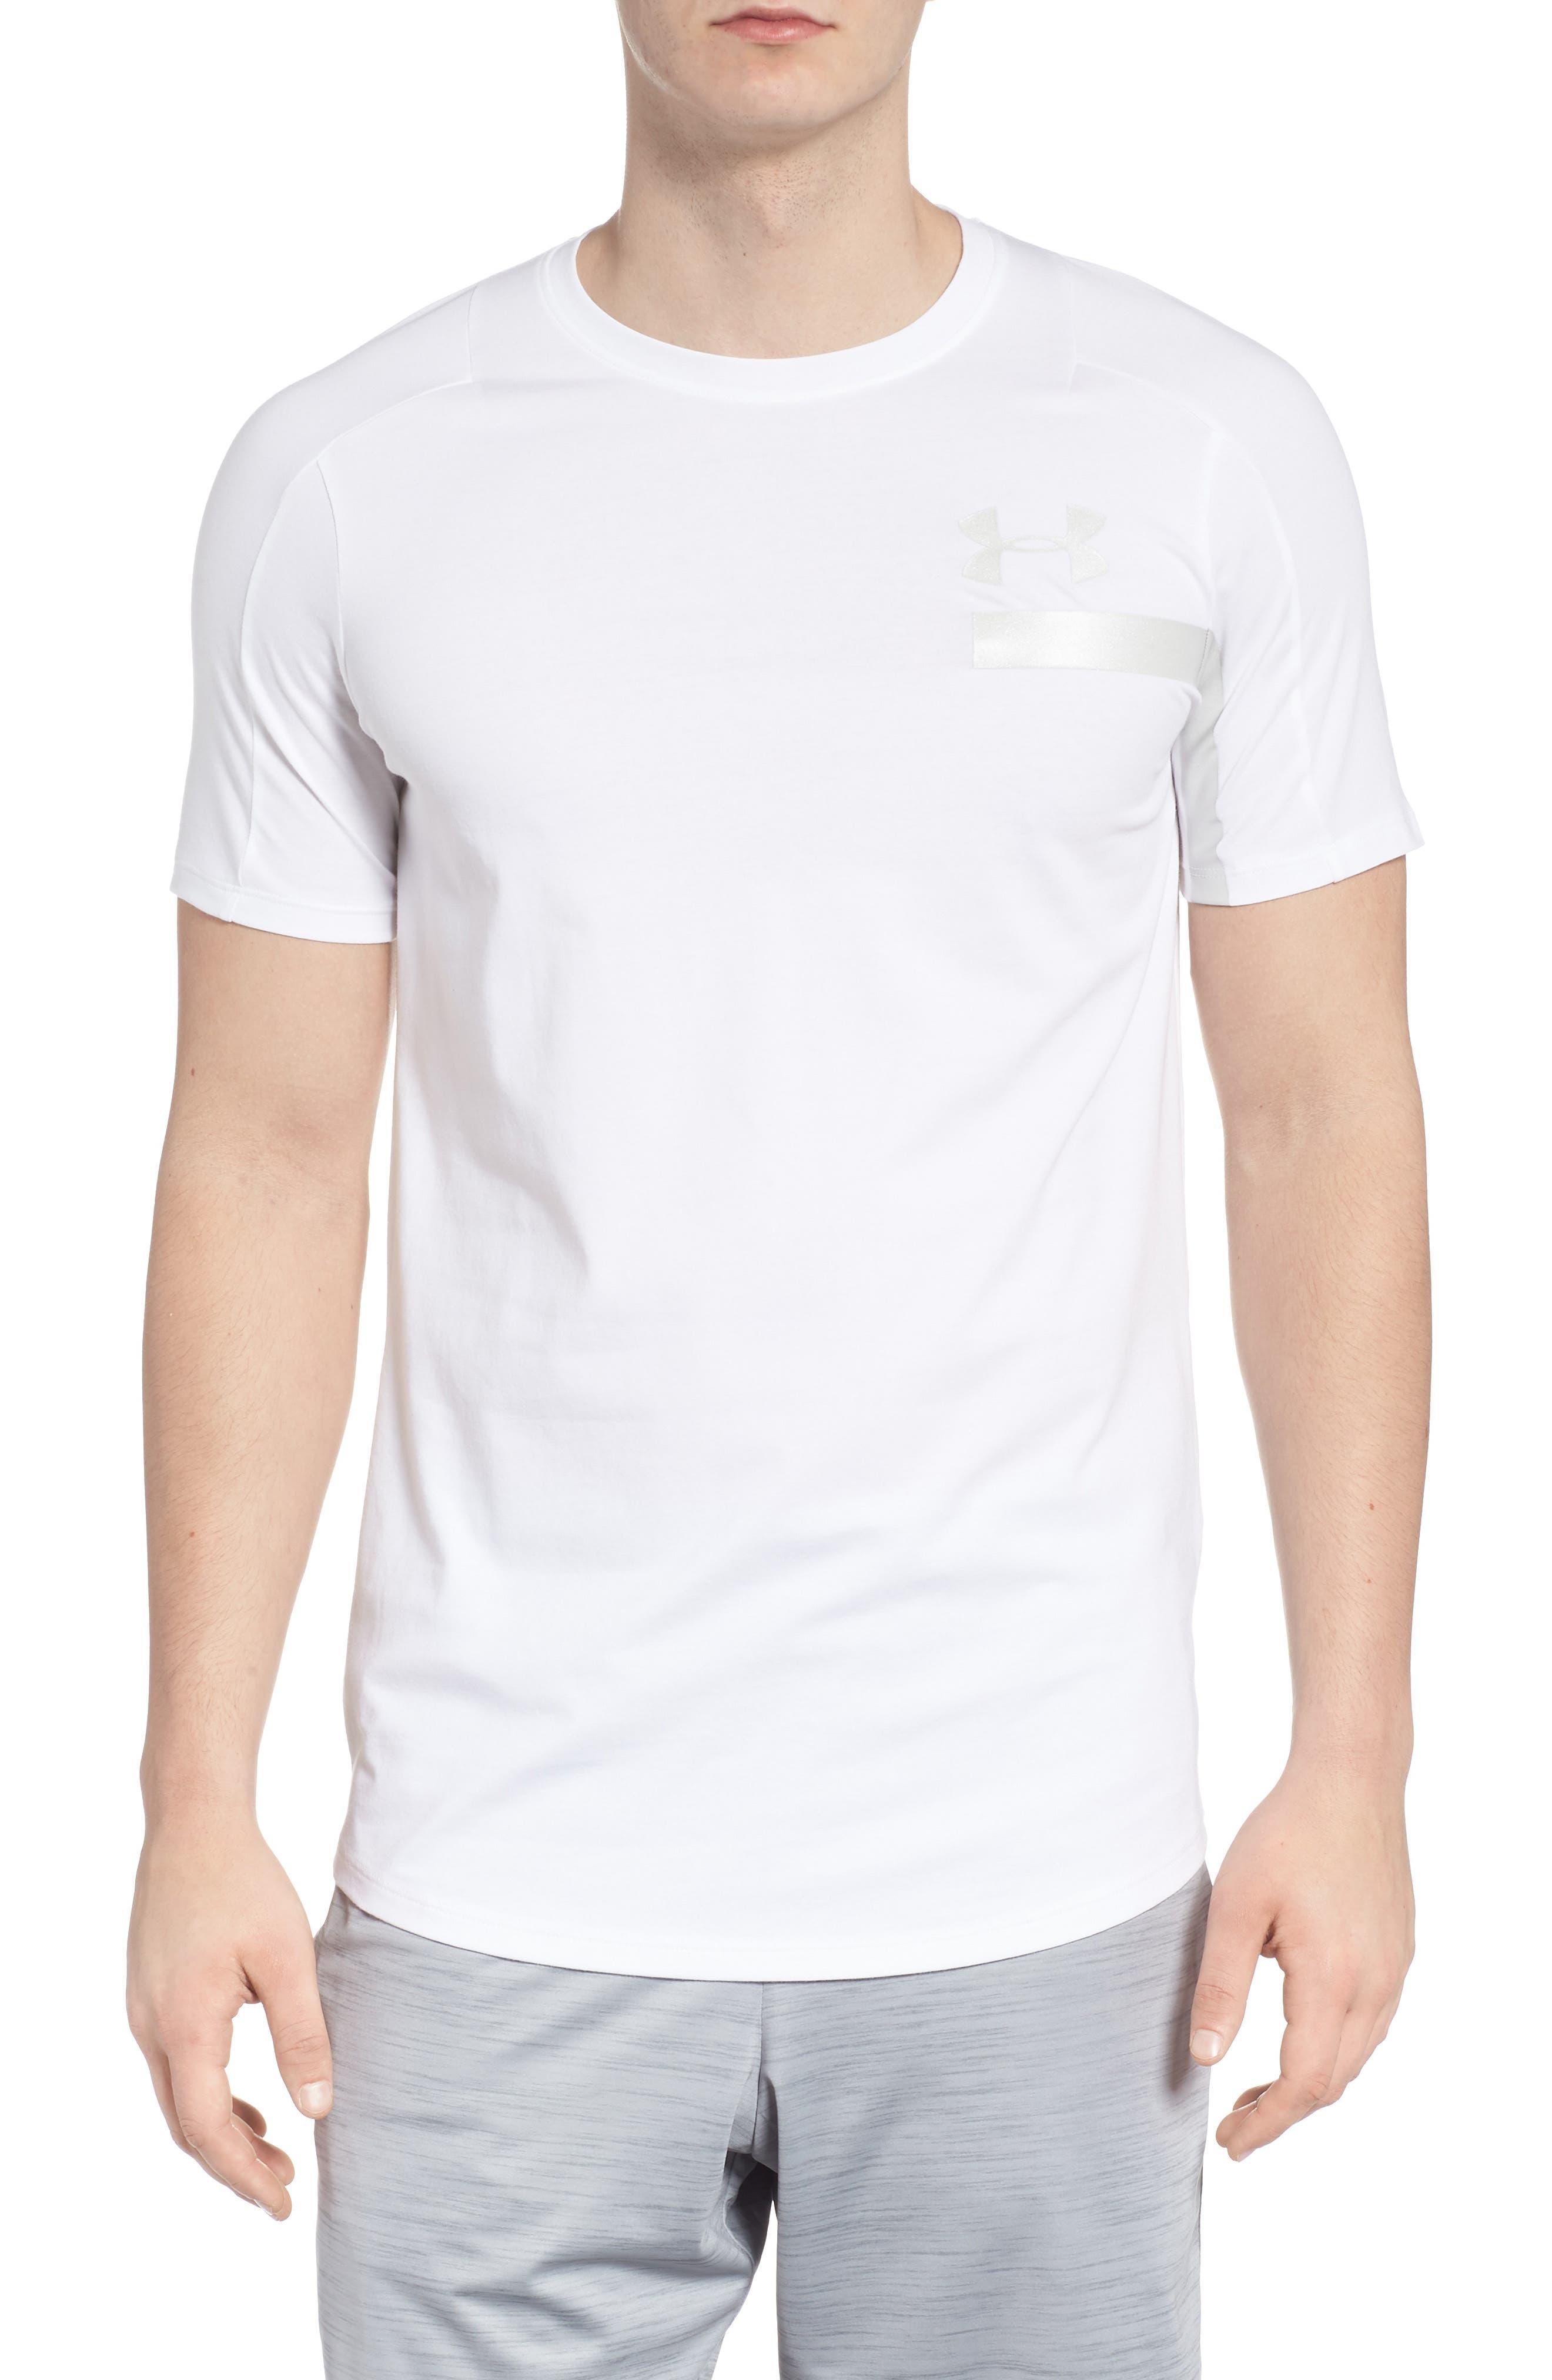 Perpetual Crewneck T-Shirt,                         Main,                         color, White/ White